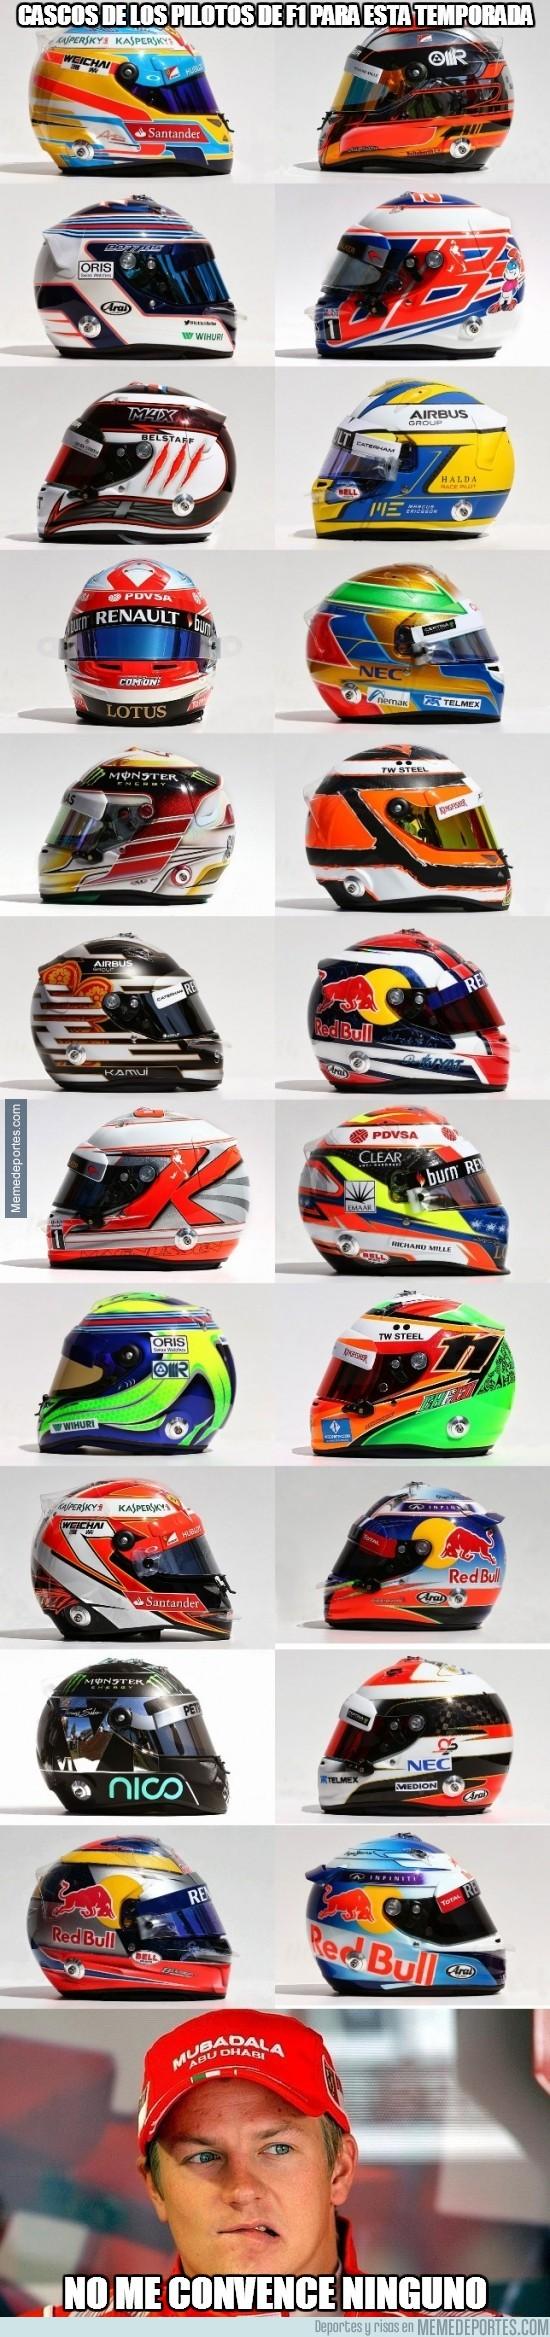 282462 - Cascos de los pilotos de f1 para esta temporada